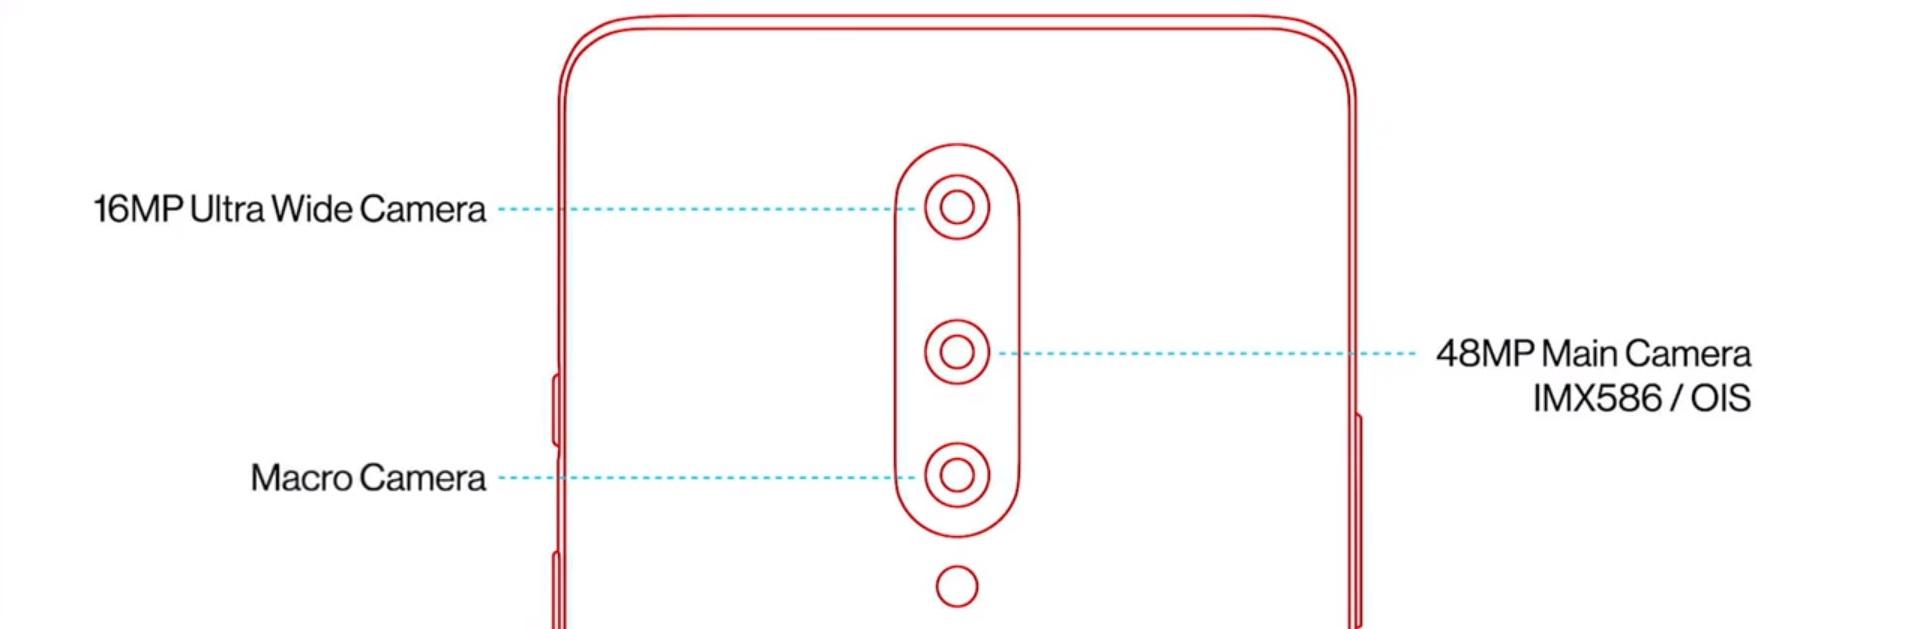 OnePlus 8 camera specs